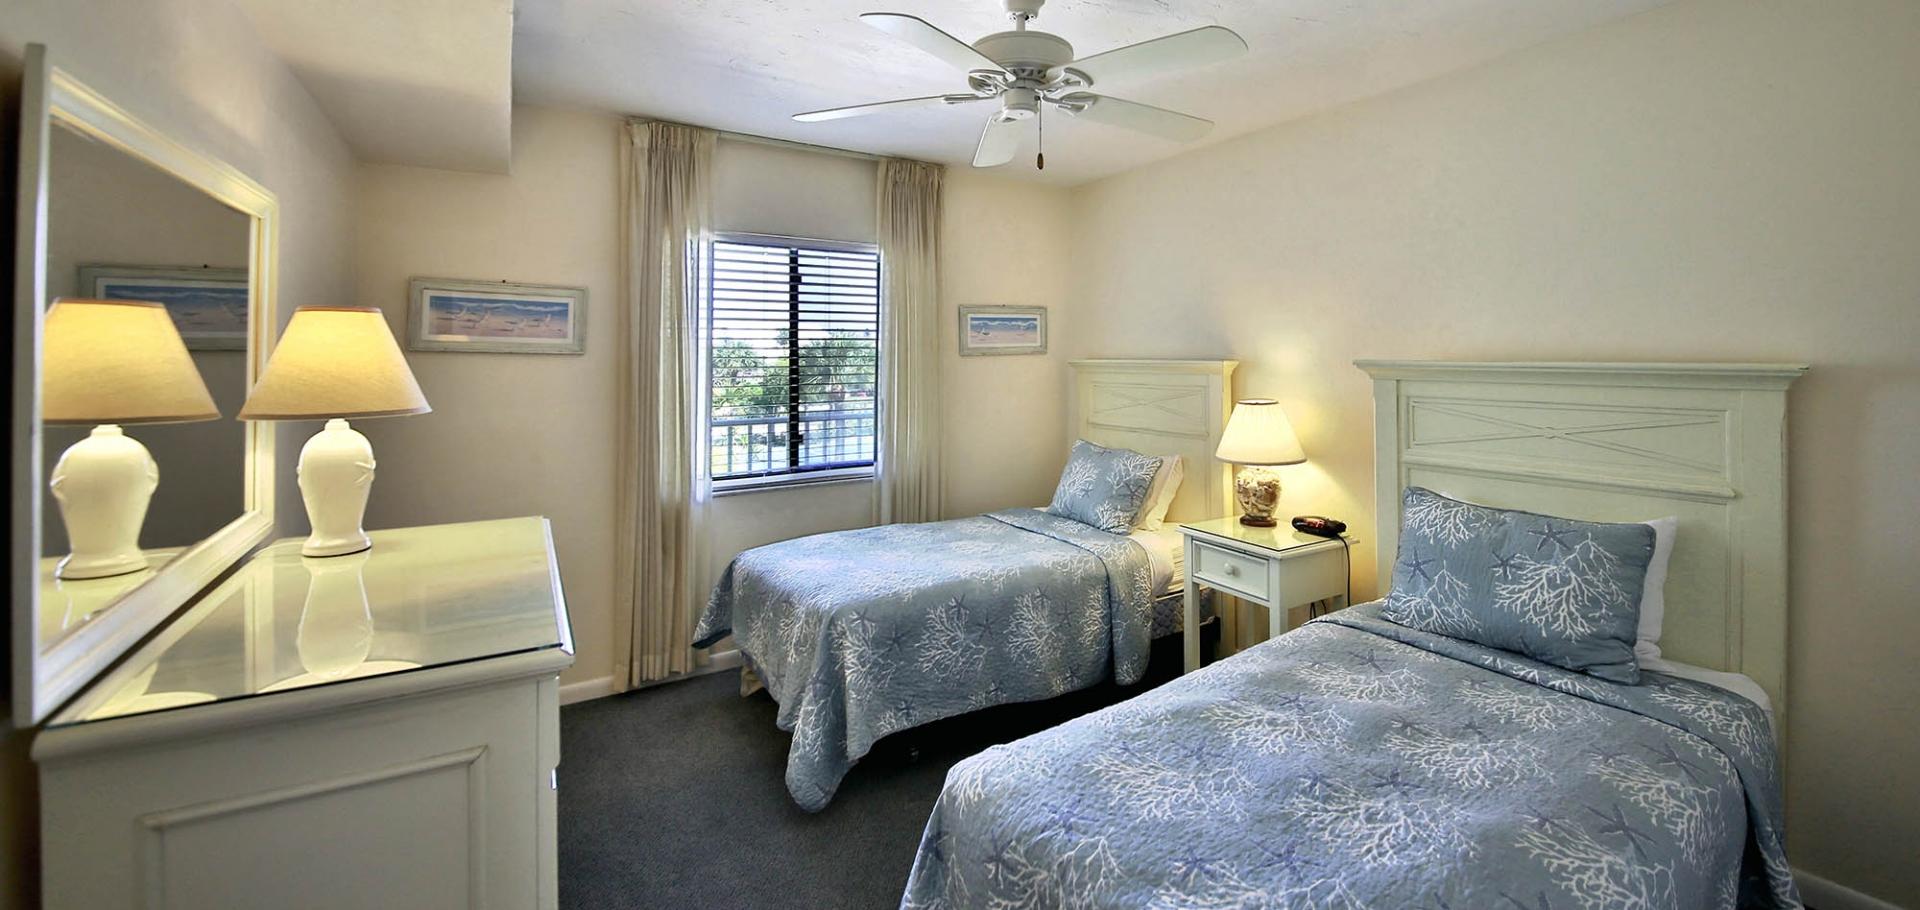 Sanibel Inn guest bedroom